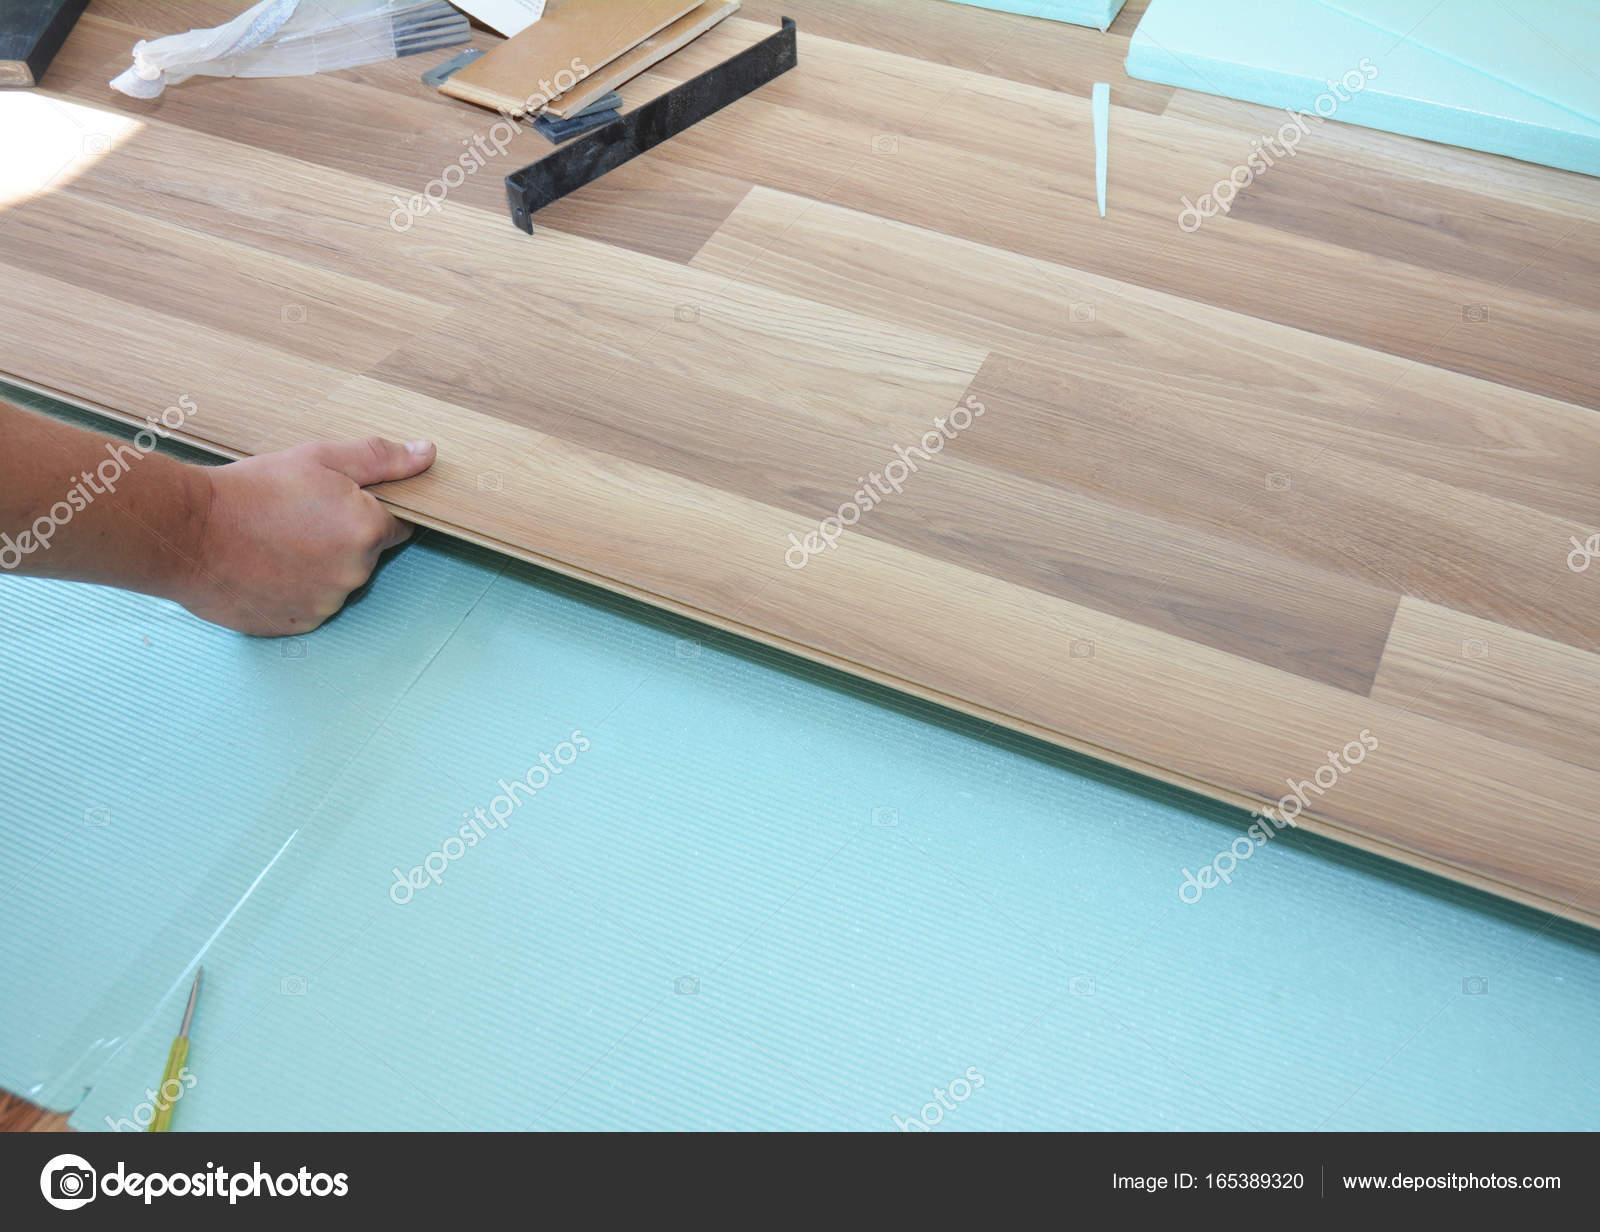 Fußboden Wärmedämmung Laminat ~ Auftragnehmer installation aus holz laminat fußböden mit